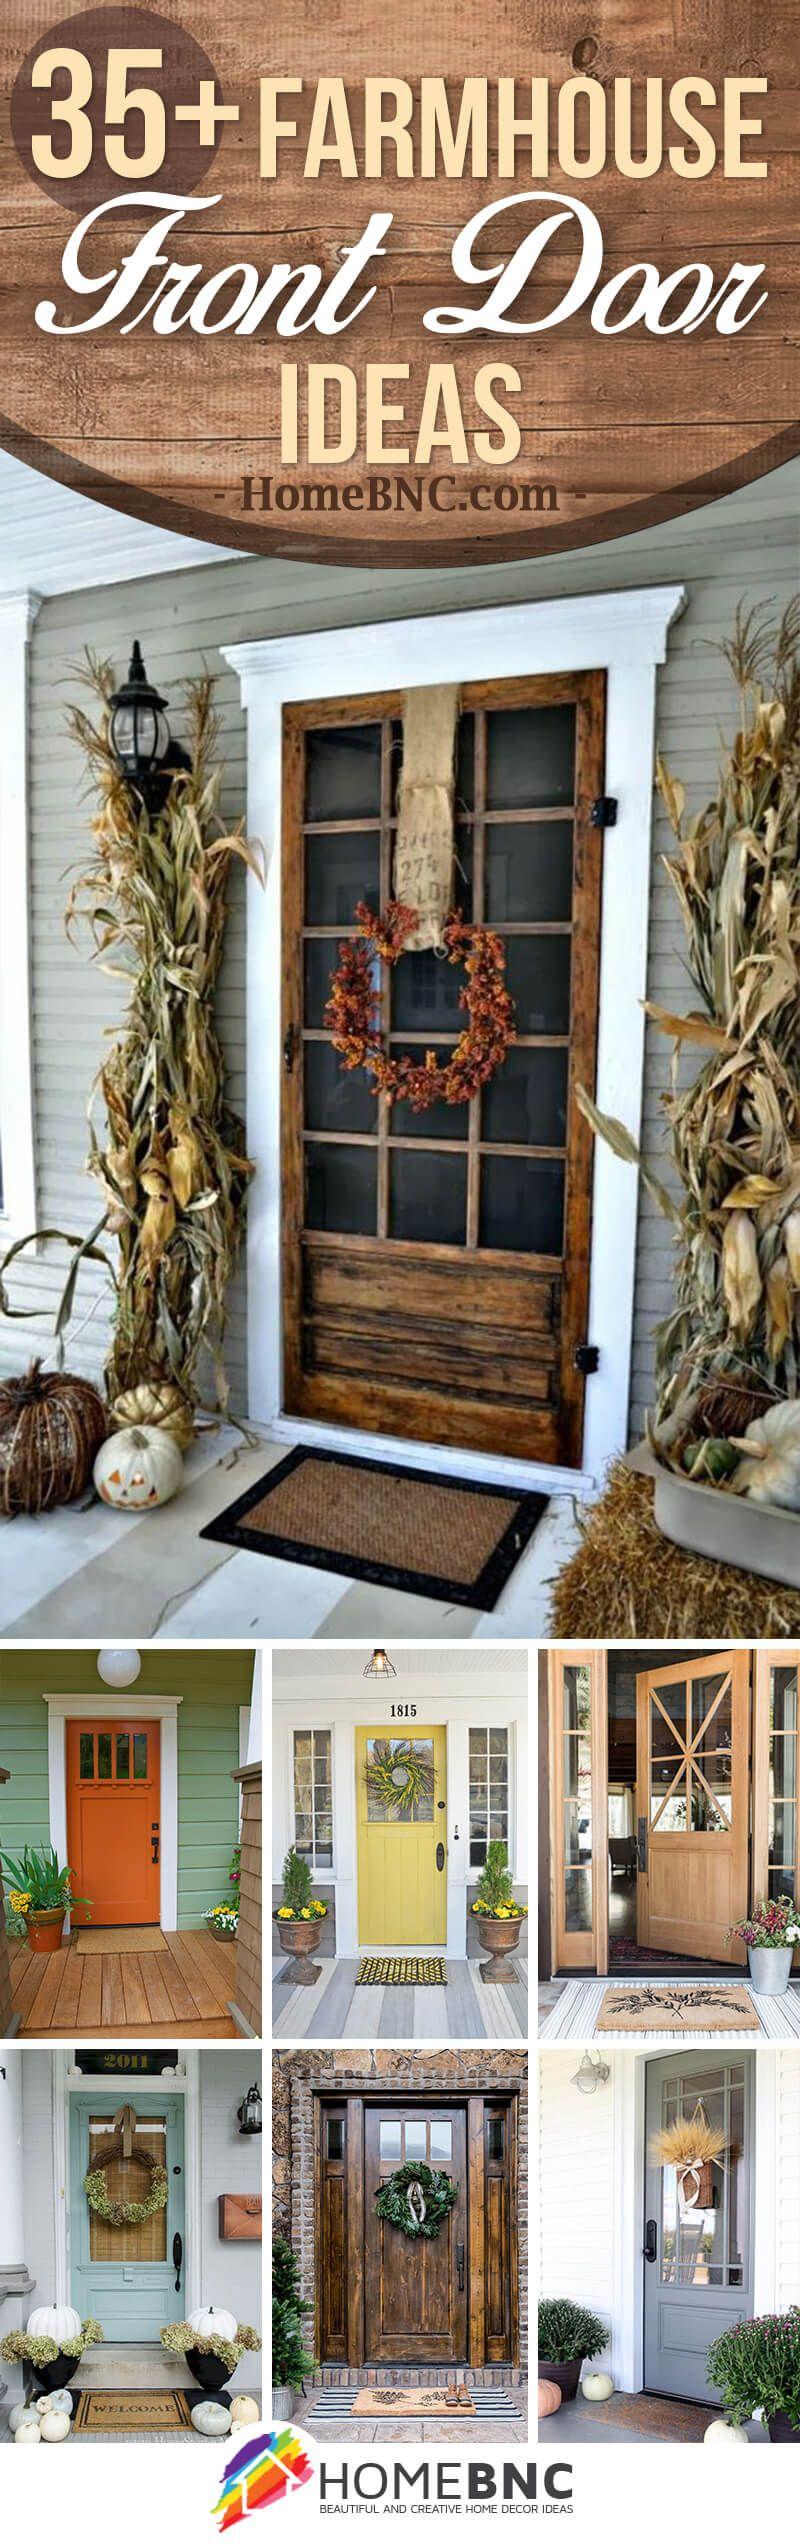 37 Gorgeous Farmhouse Front Door Ideas To Give Your Home A Makeover Farmhouse Front Door Farmhouse Front Farmhouse Decor